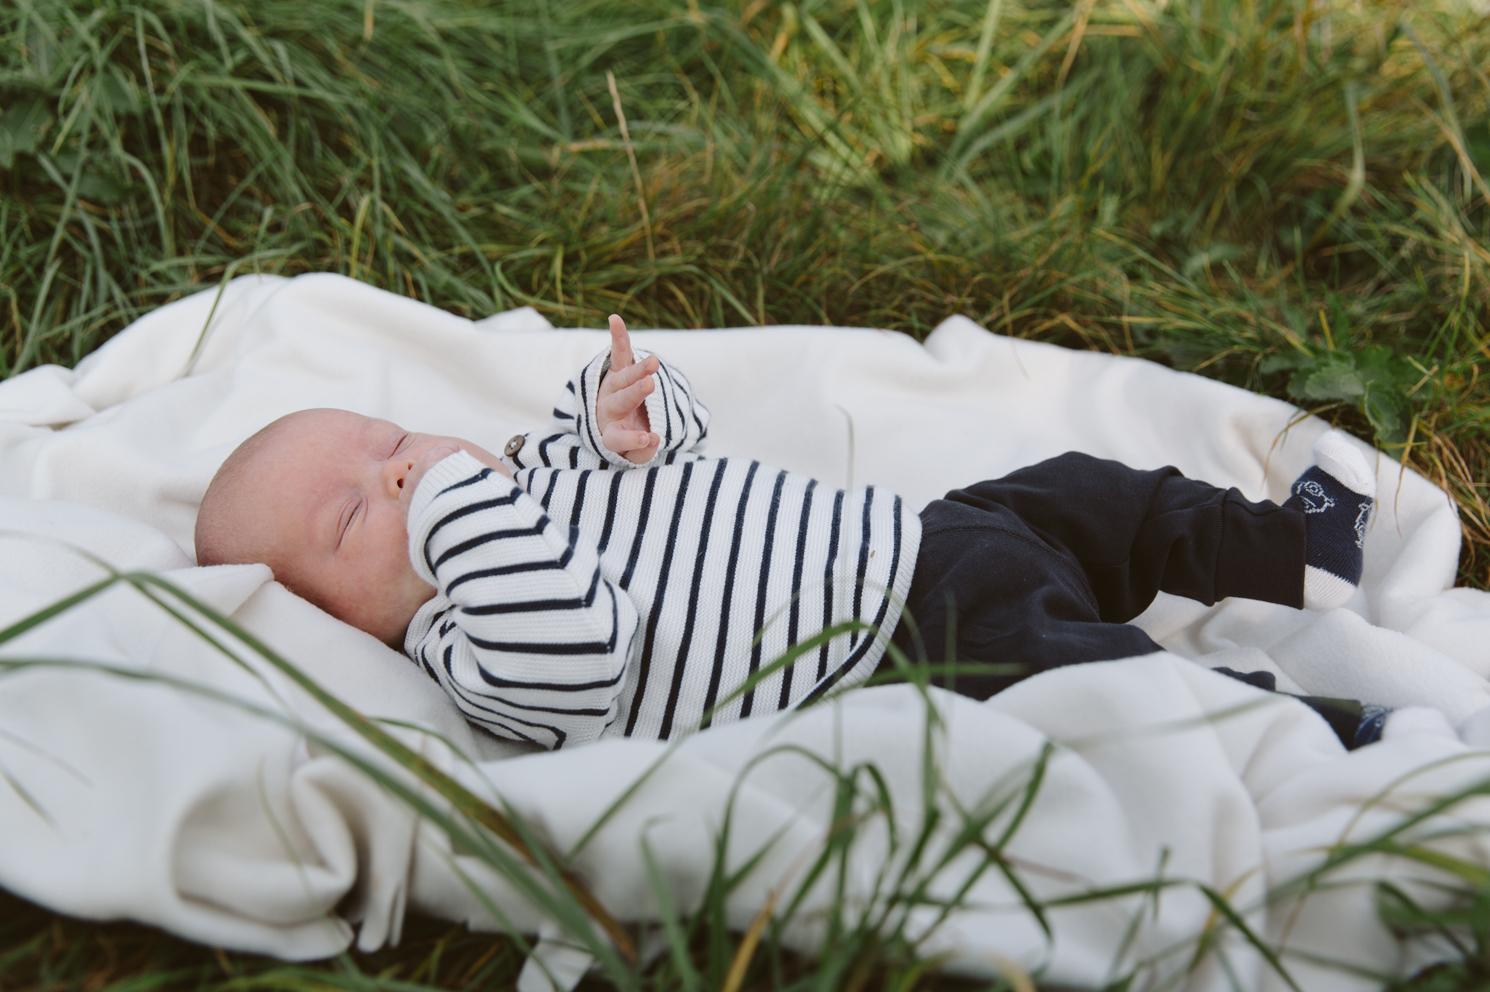 familjefotografering-barn-syskonfotografering-lillebror-storasyster-maria-o-photo-klagerup-10